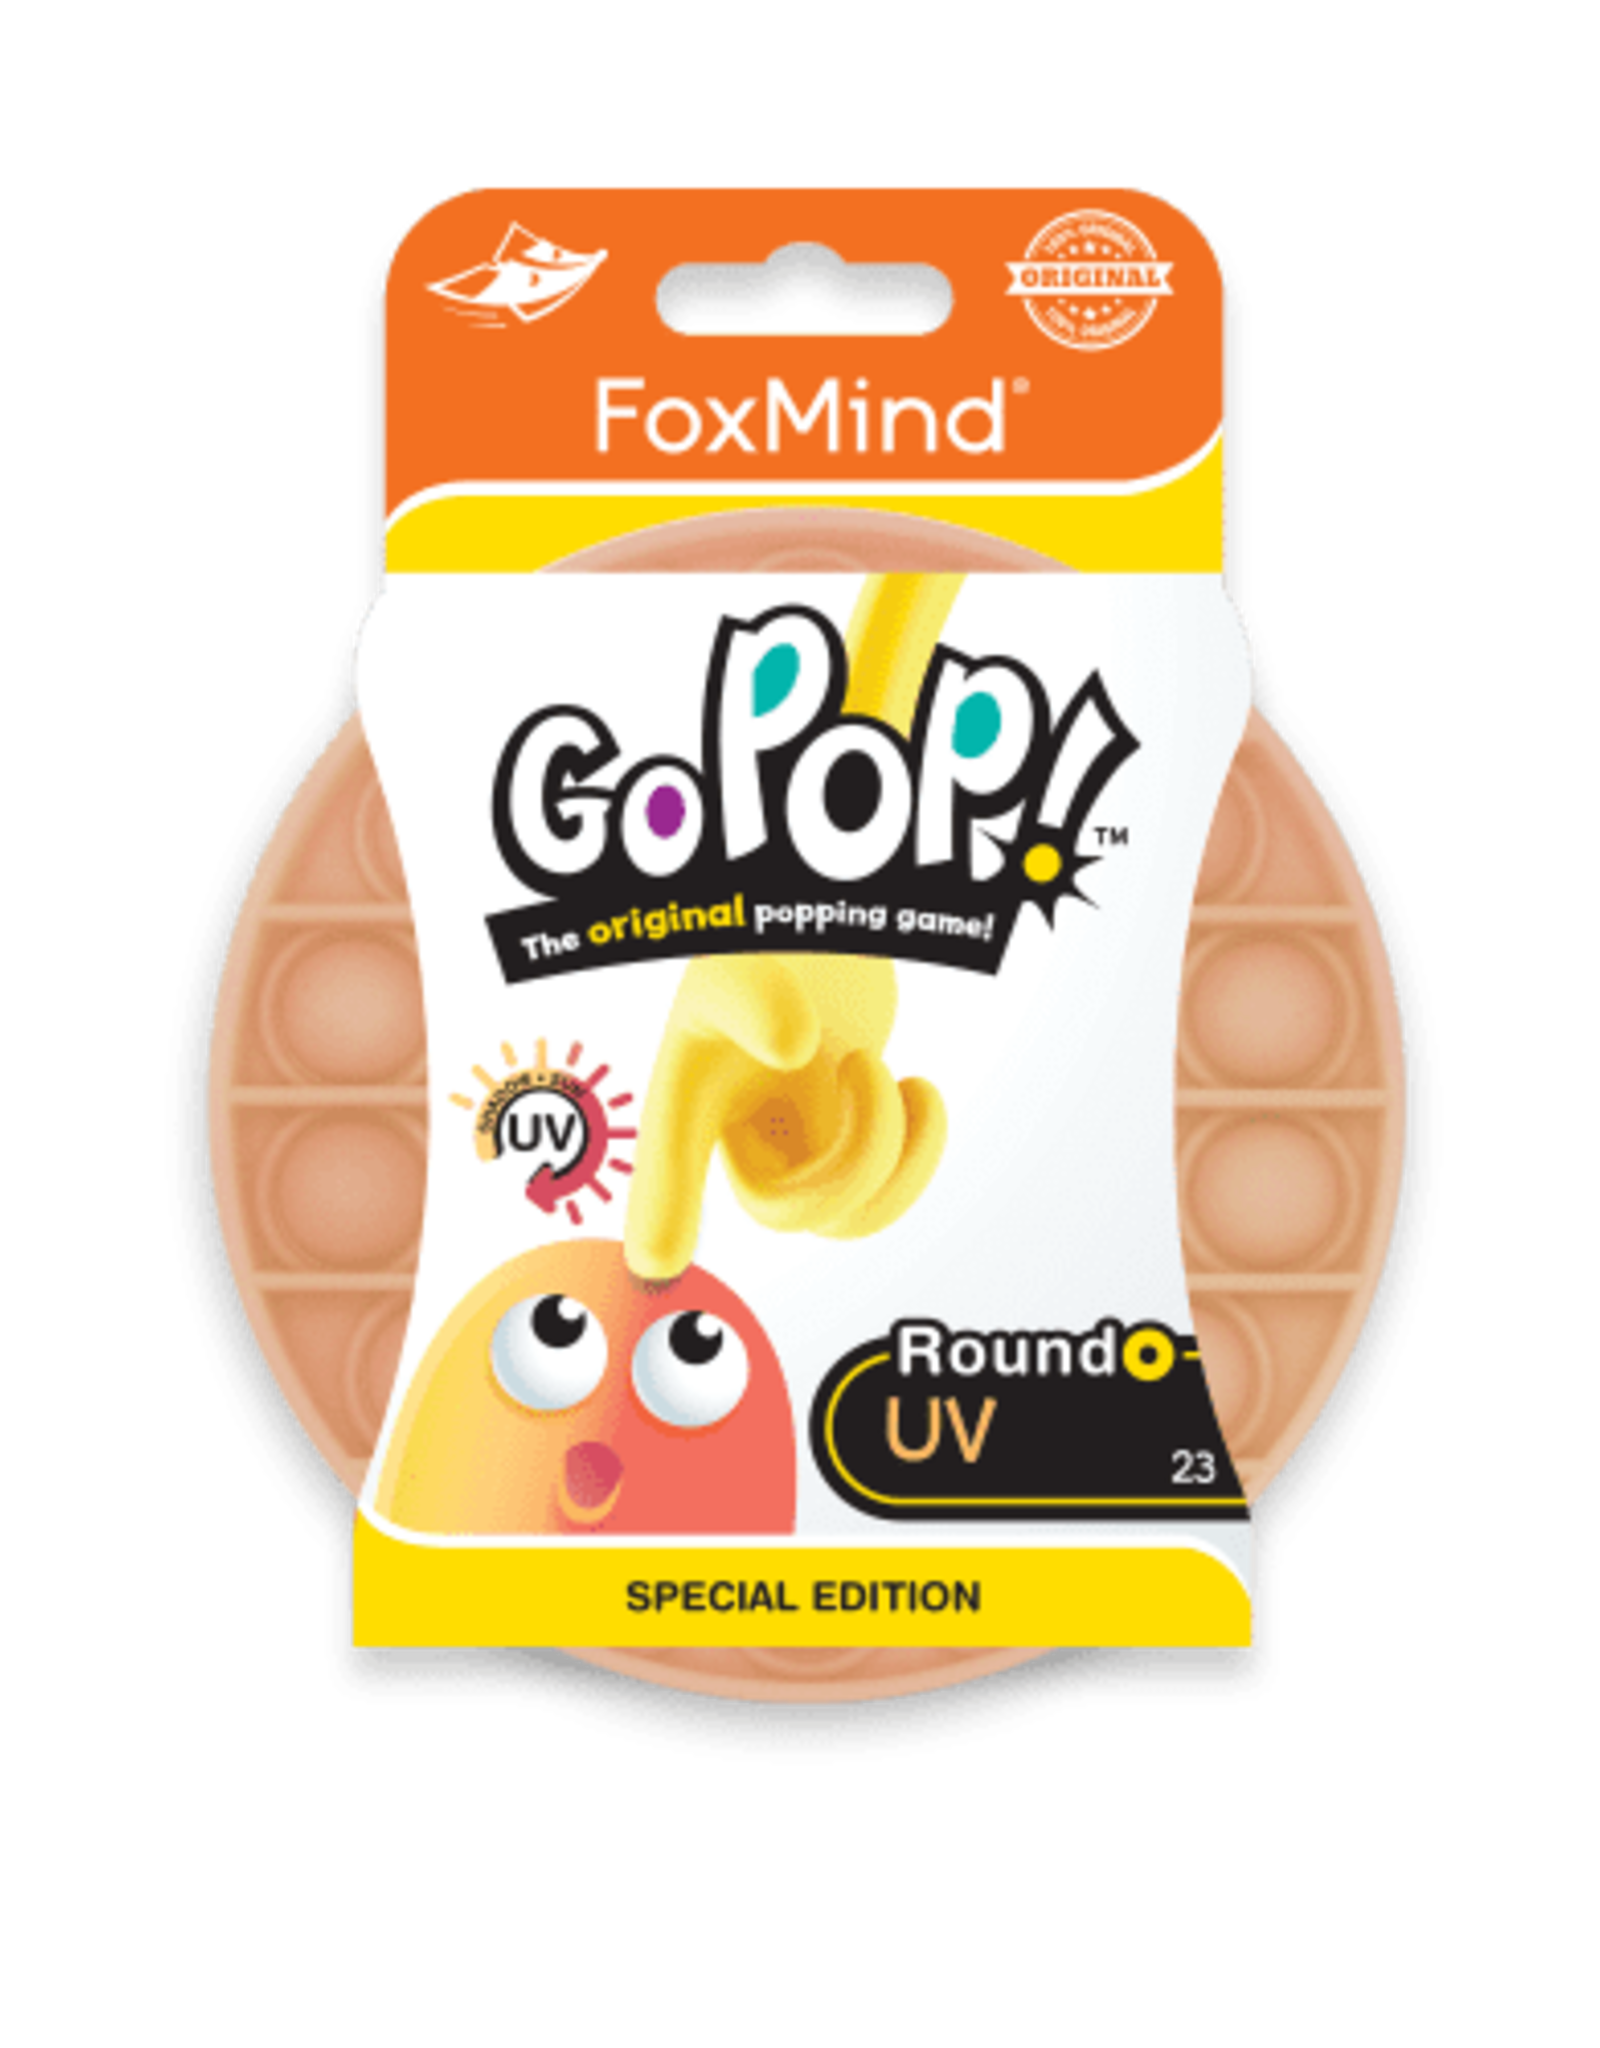 Foxmind Go Pop Roundo - UV